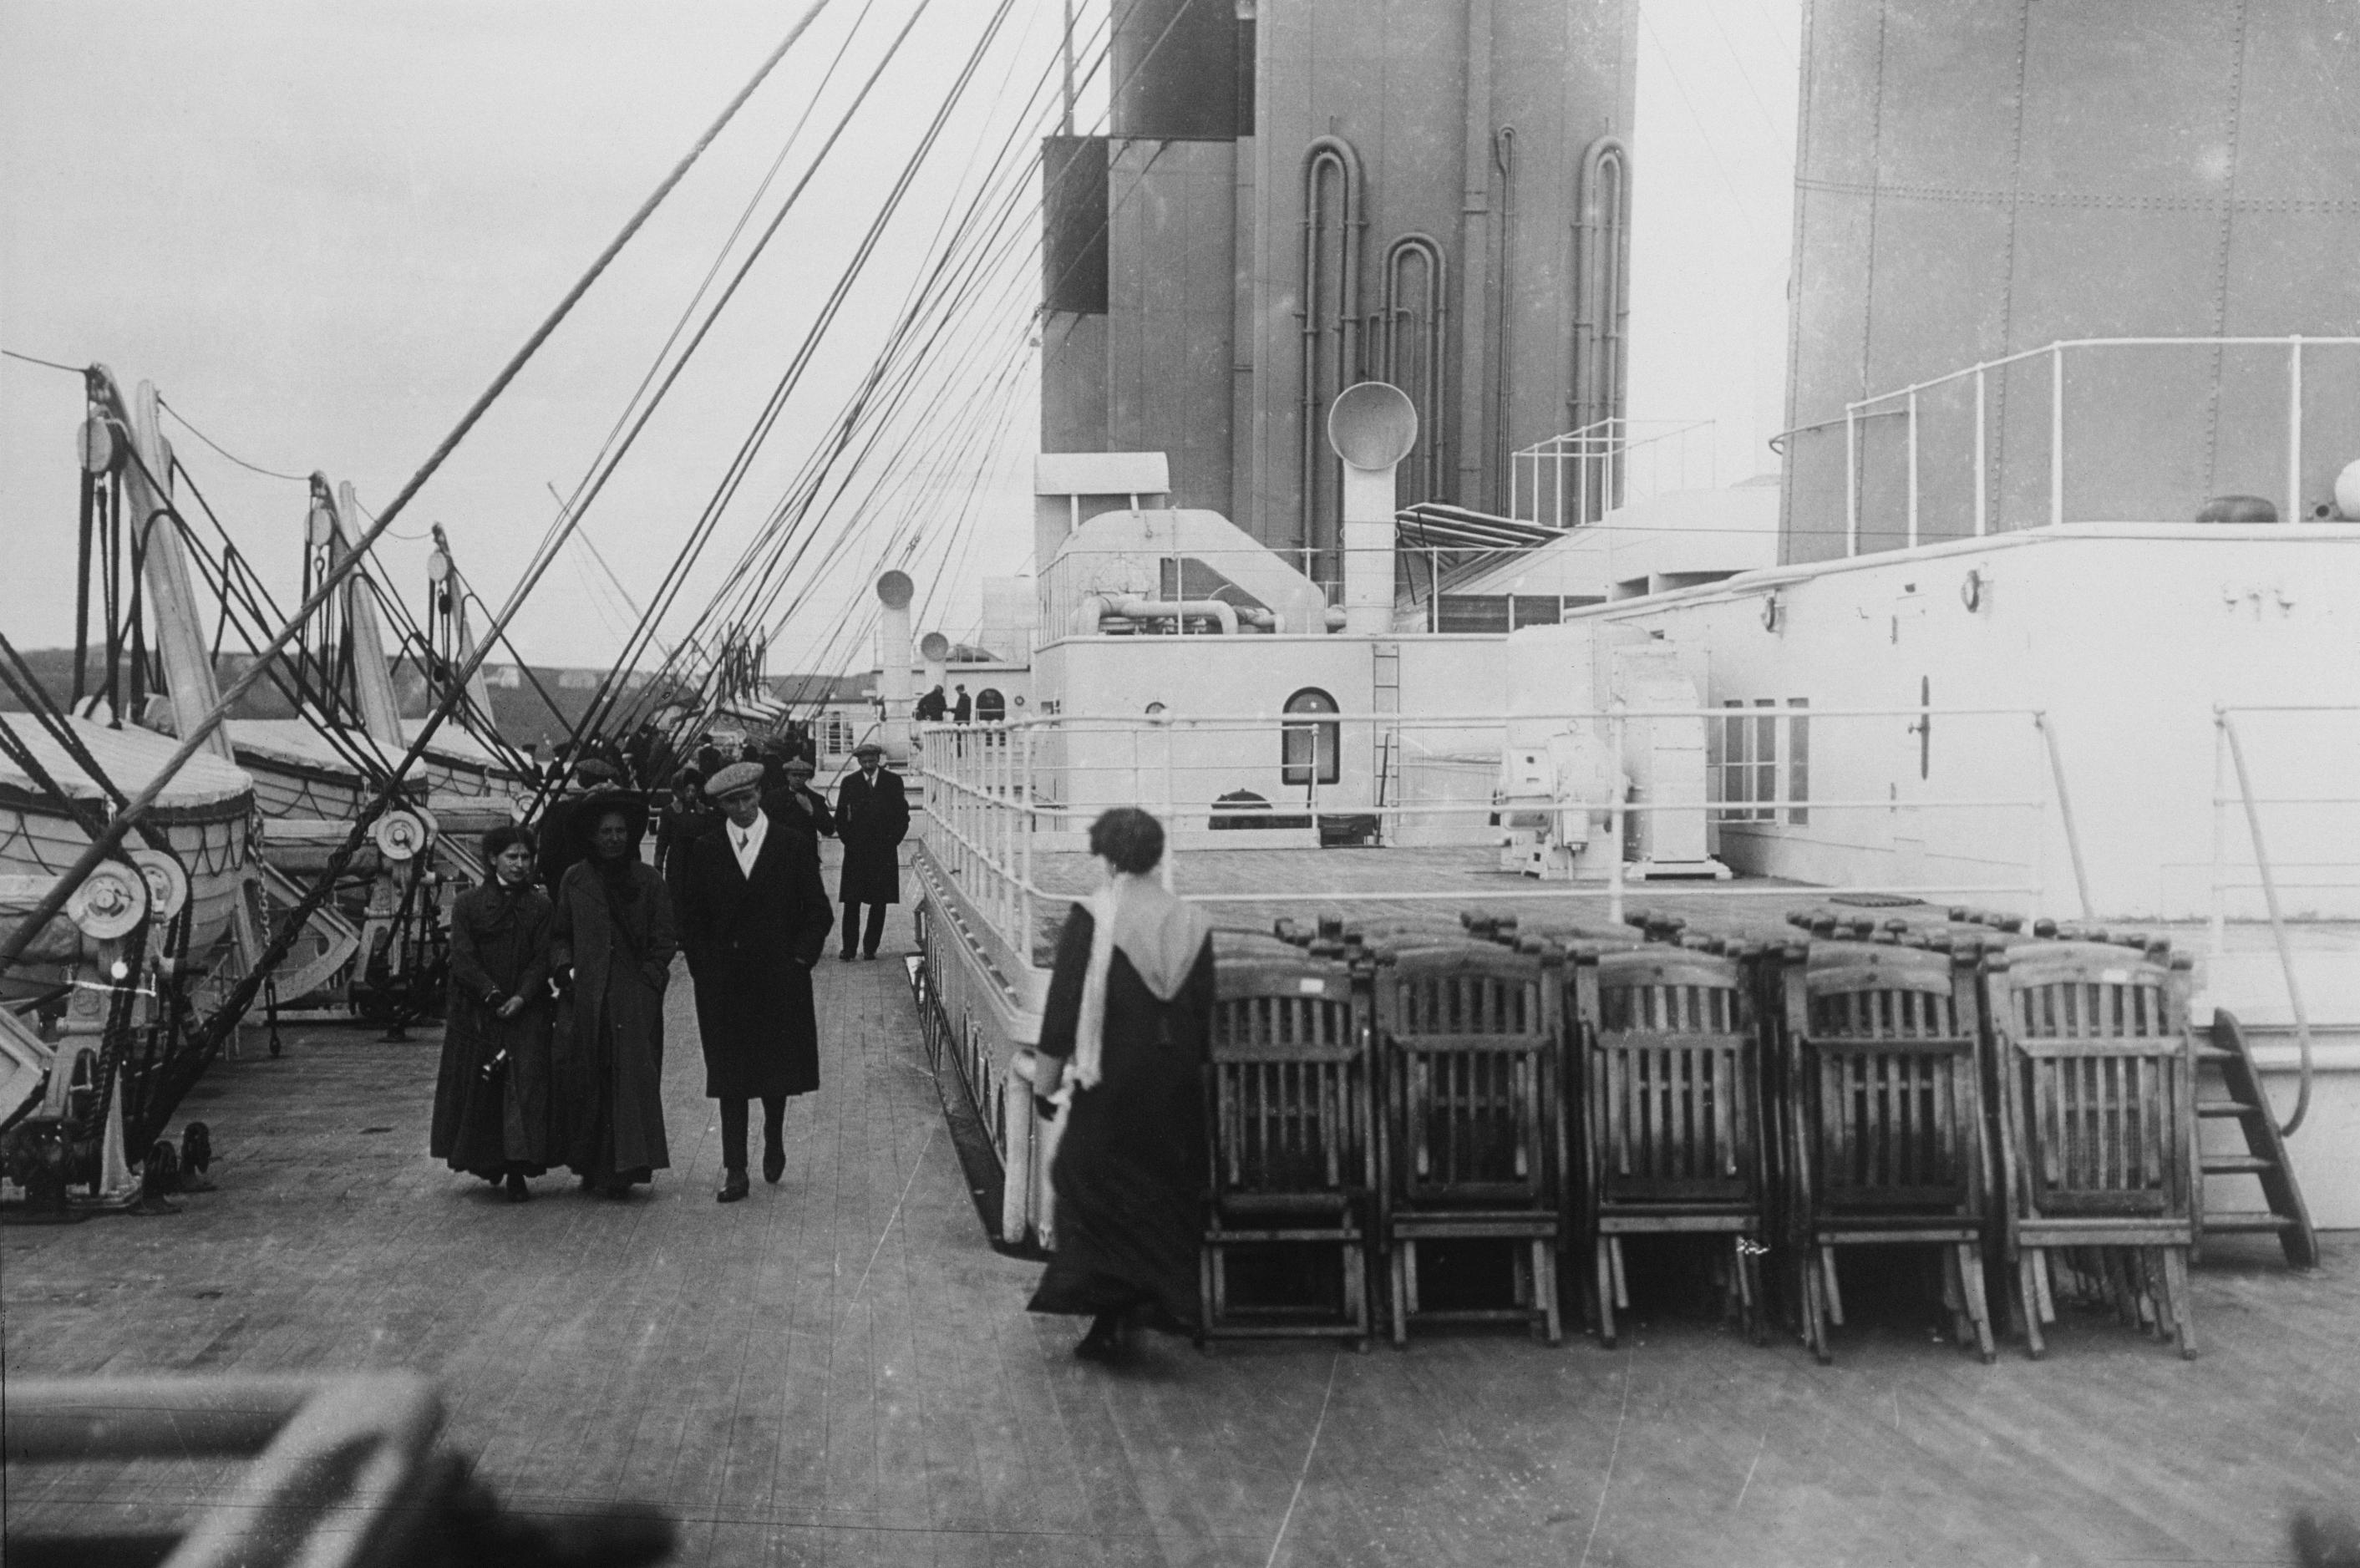 titanic passengers stroll past neatly arranged dec